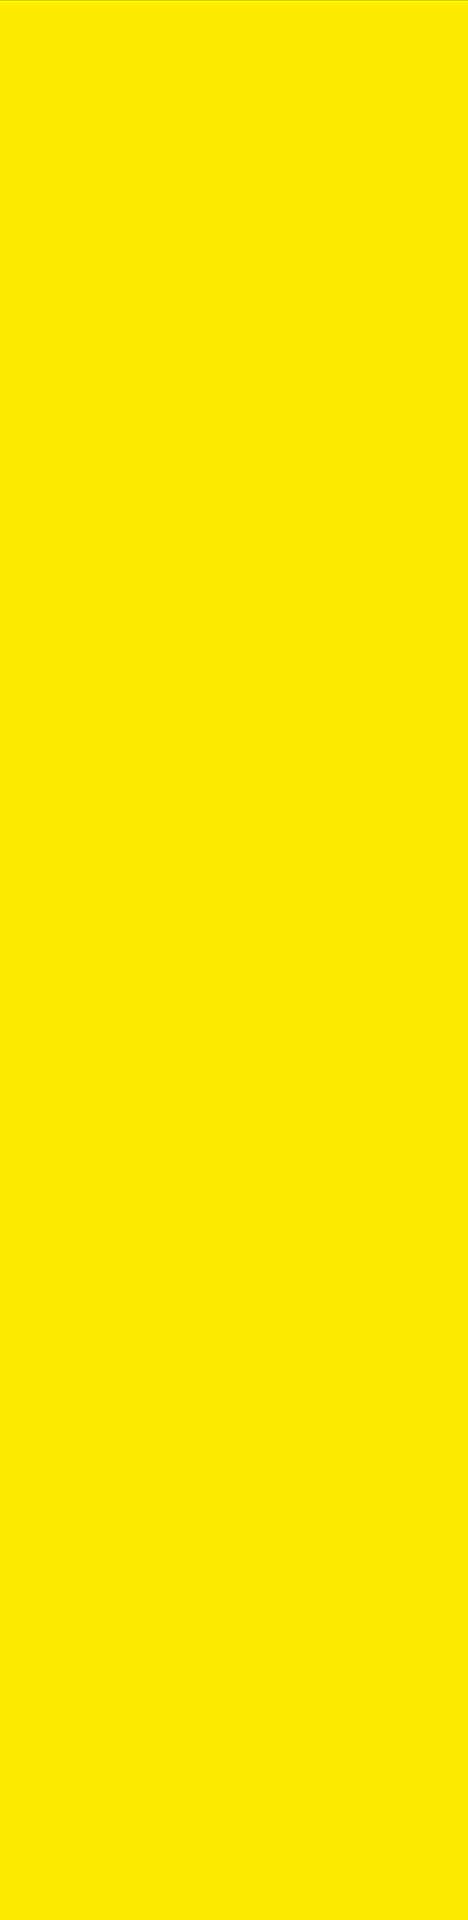 Brunel_WEB_2700x900px_Handige apps